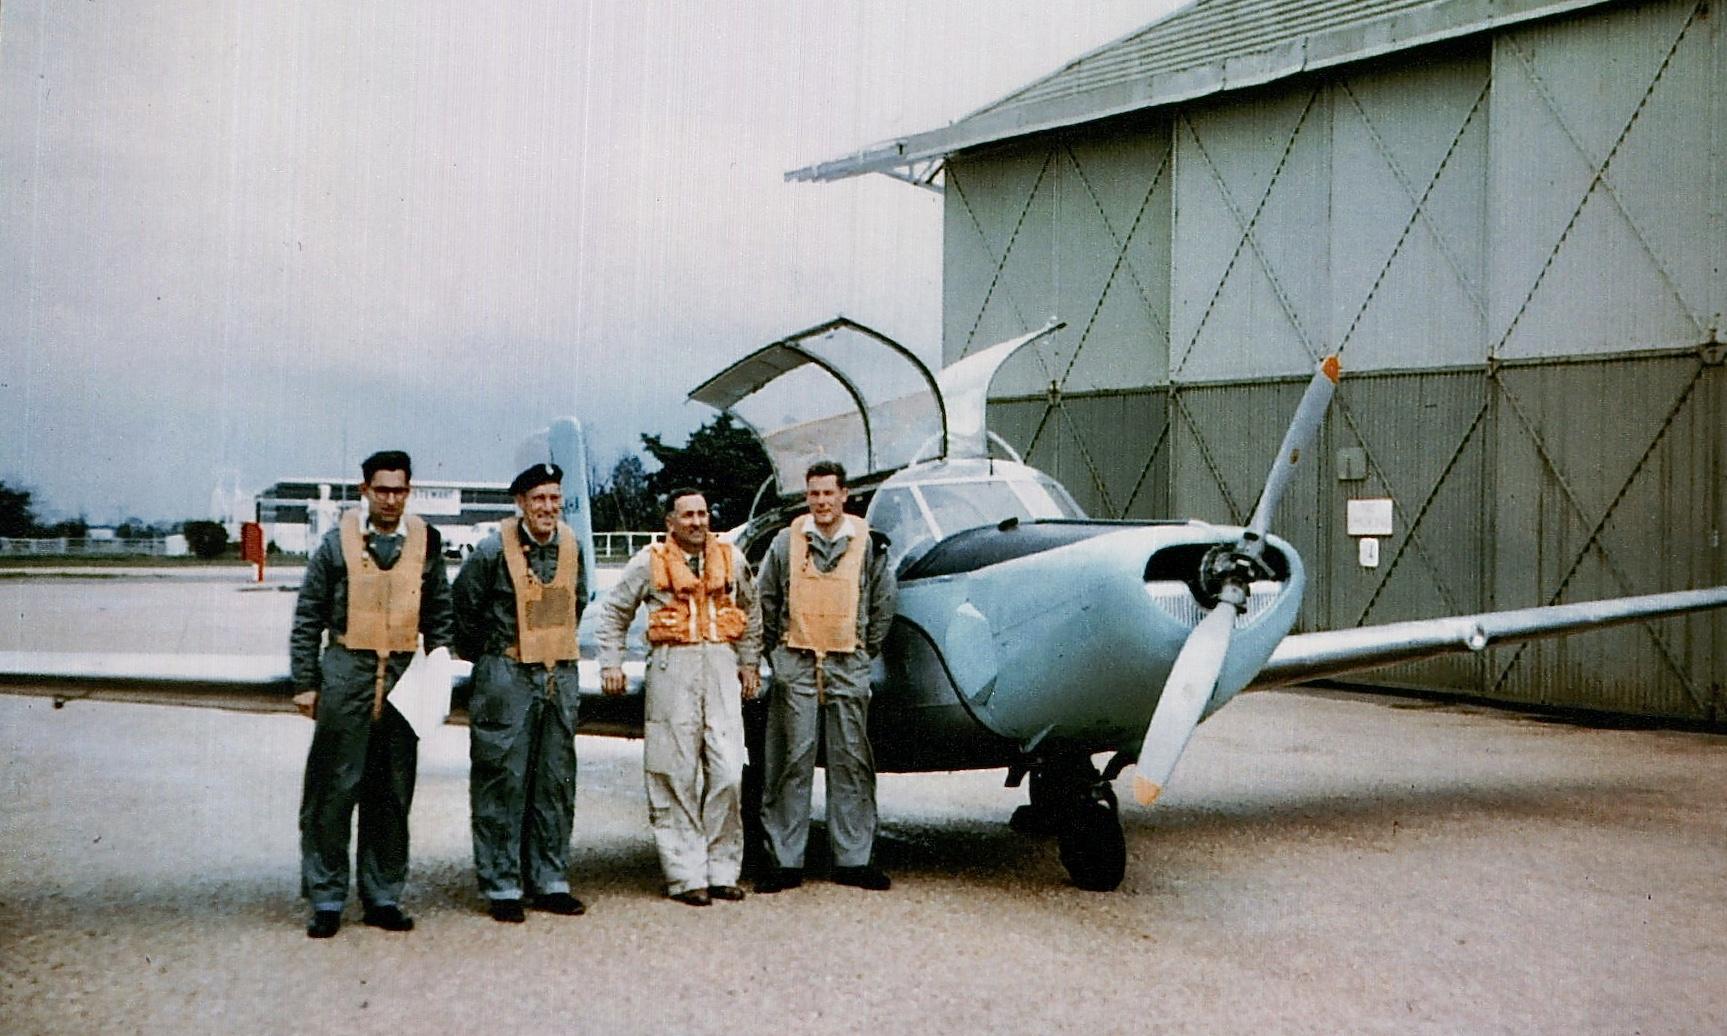 N Barratt, M Wilson, H D'alton, M Wilson 1963